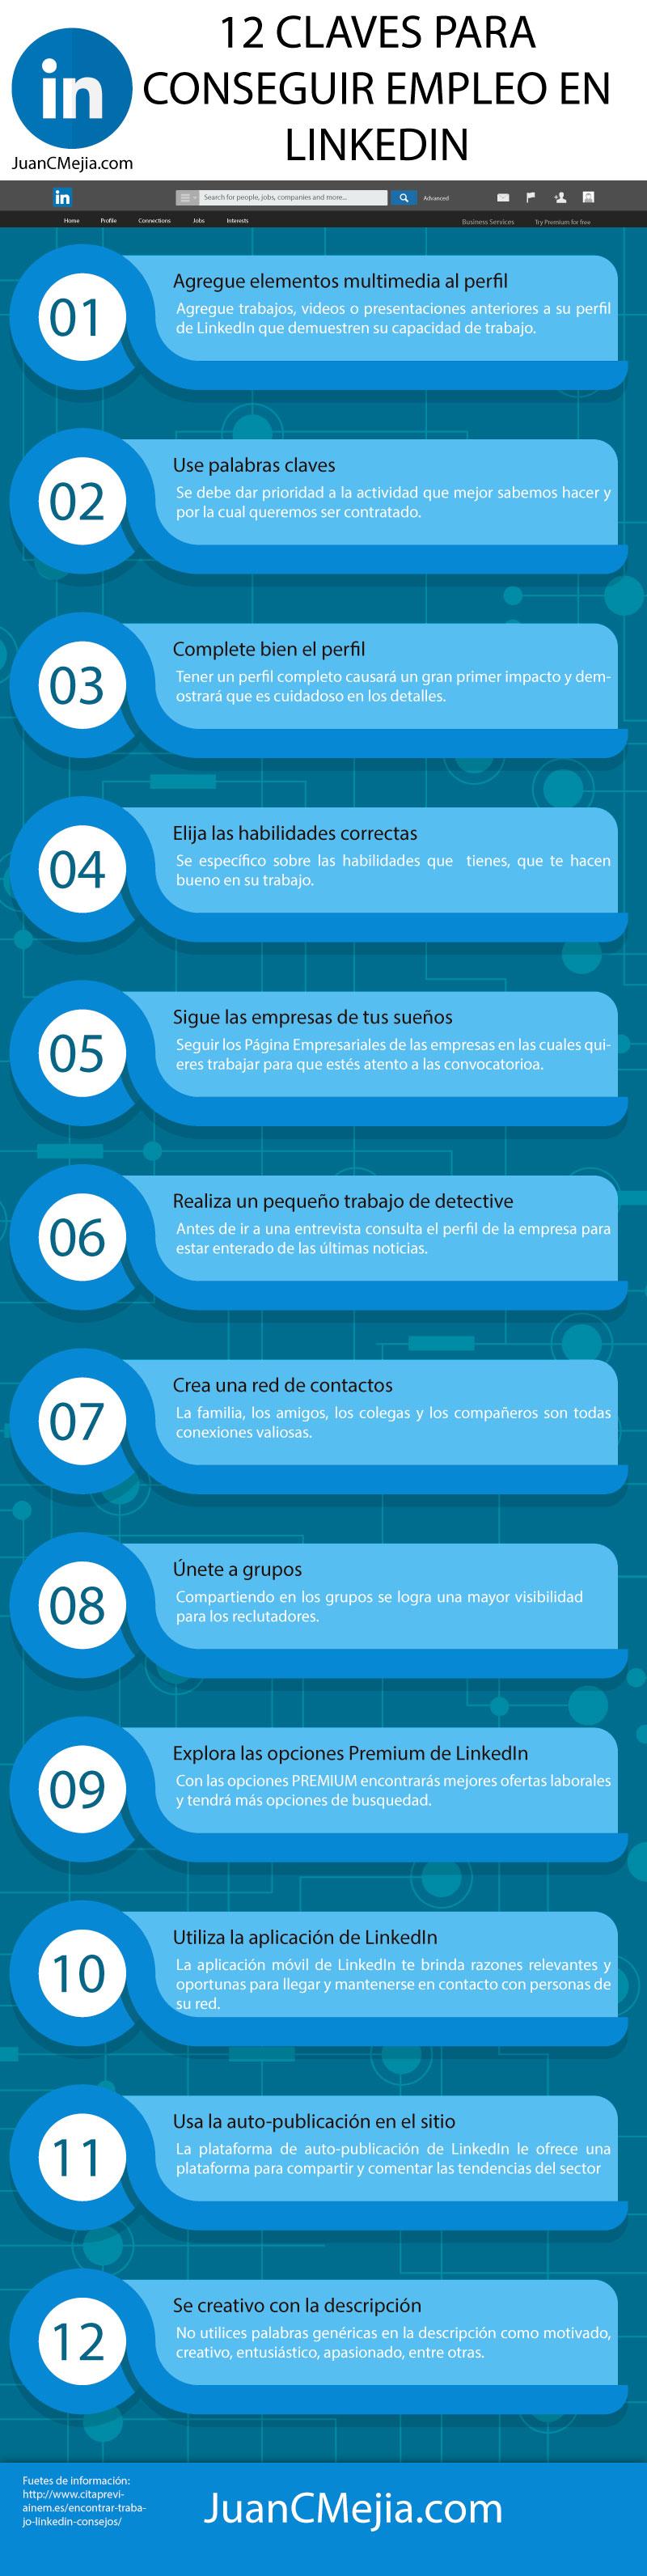 12 claves para conseguir empleo en LinkedIn #infografia #empleo #socialmedia